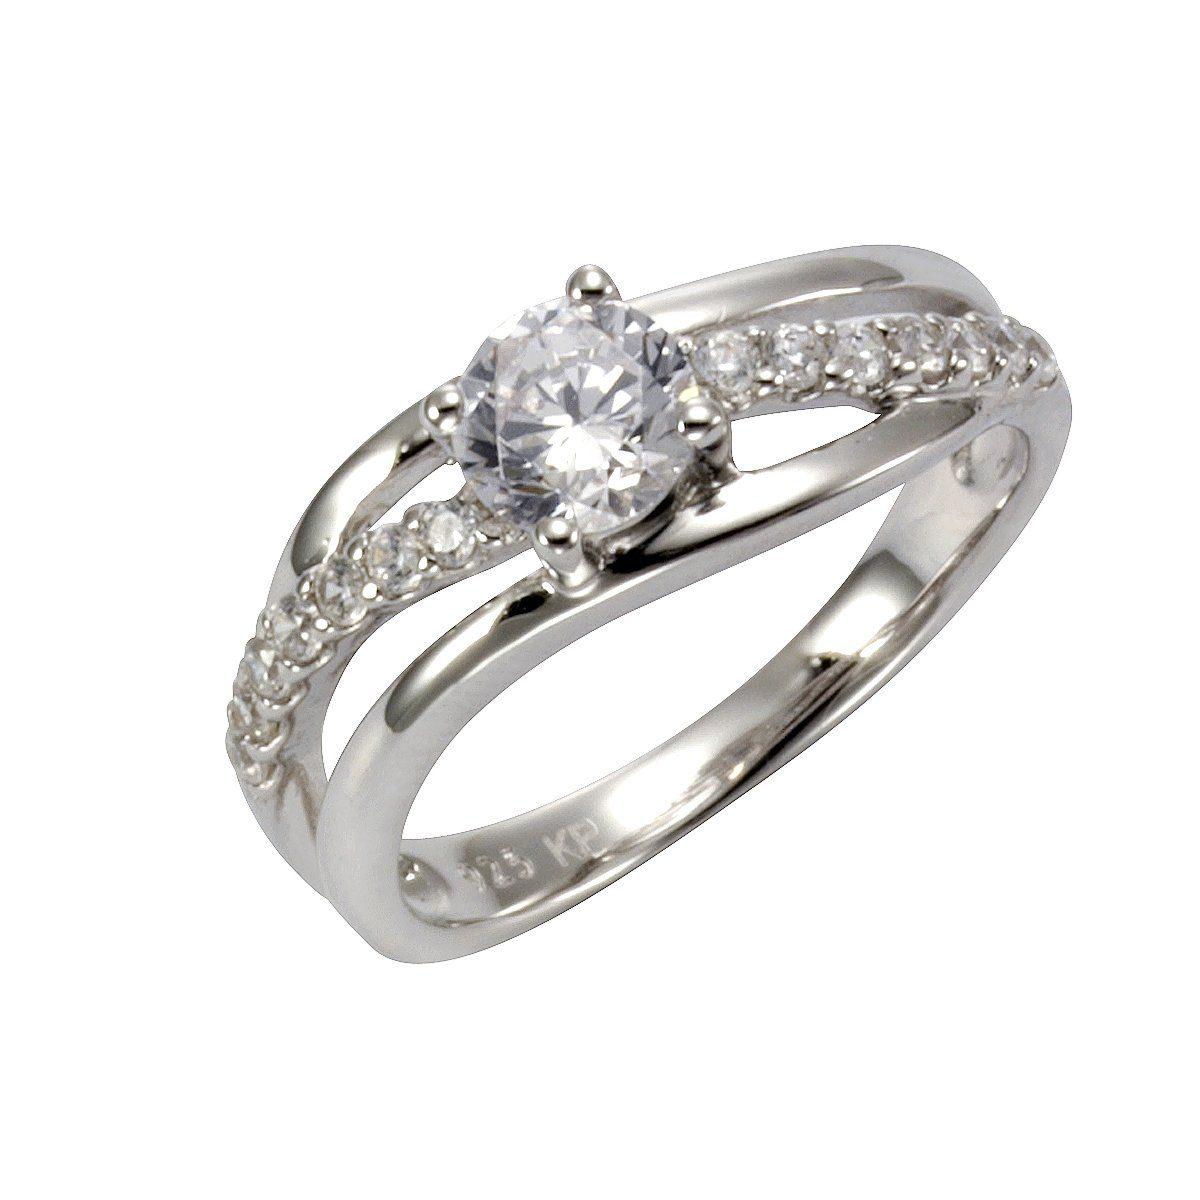 Picnf5jnj5cojphl29gy29lnjqcozsfpl85bp81ll9vav85bqiwlwl3zmt3atsymgevlmzmlgwvagsxaqewmzrmbp5dptpdamen Silber Ring Aus 925er Sterling Silber